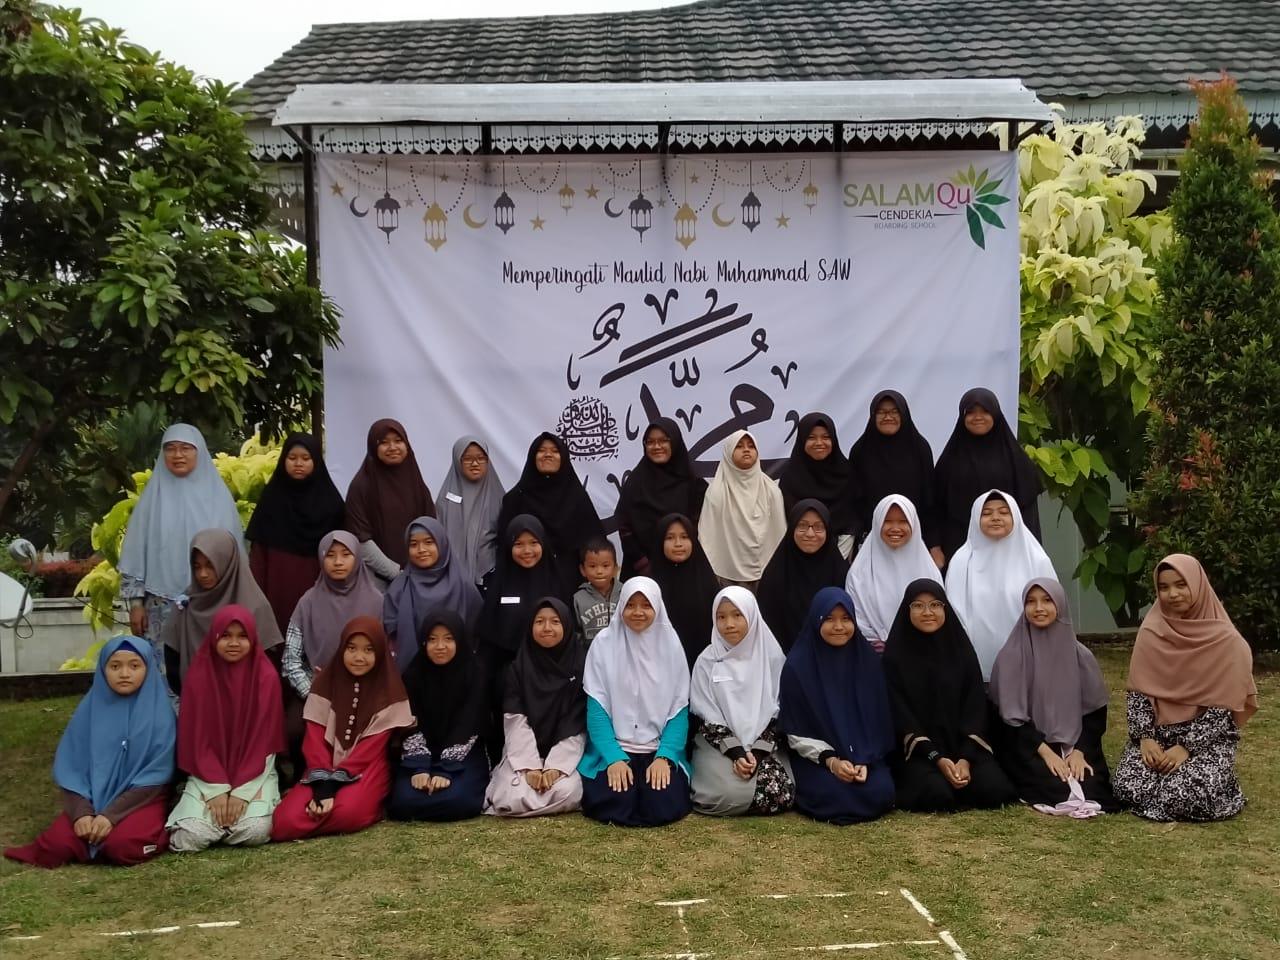 SMP SalamQu Cendekia